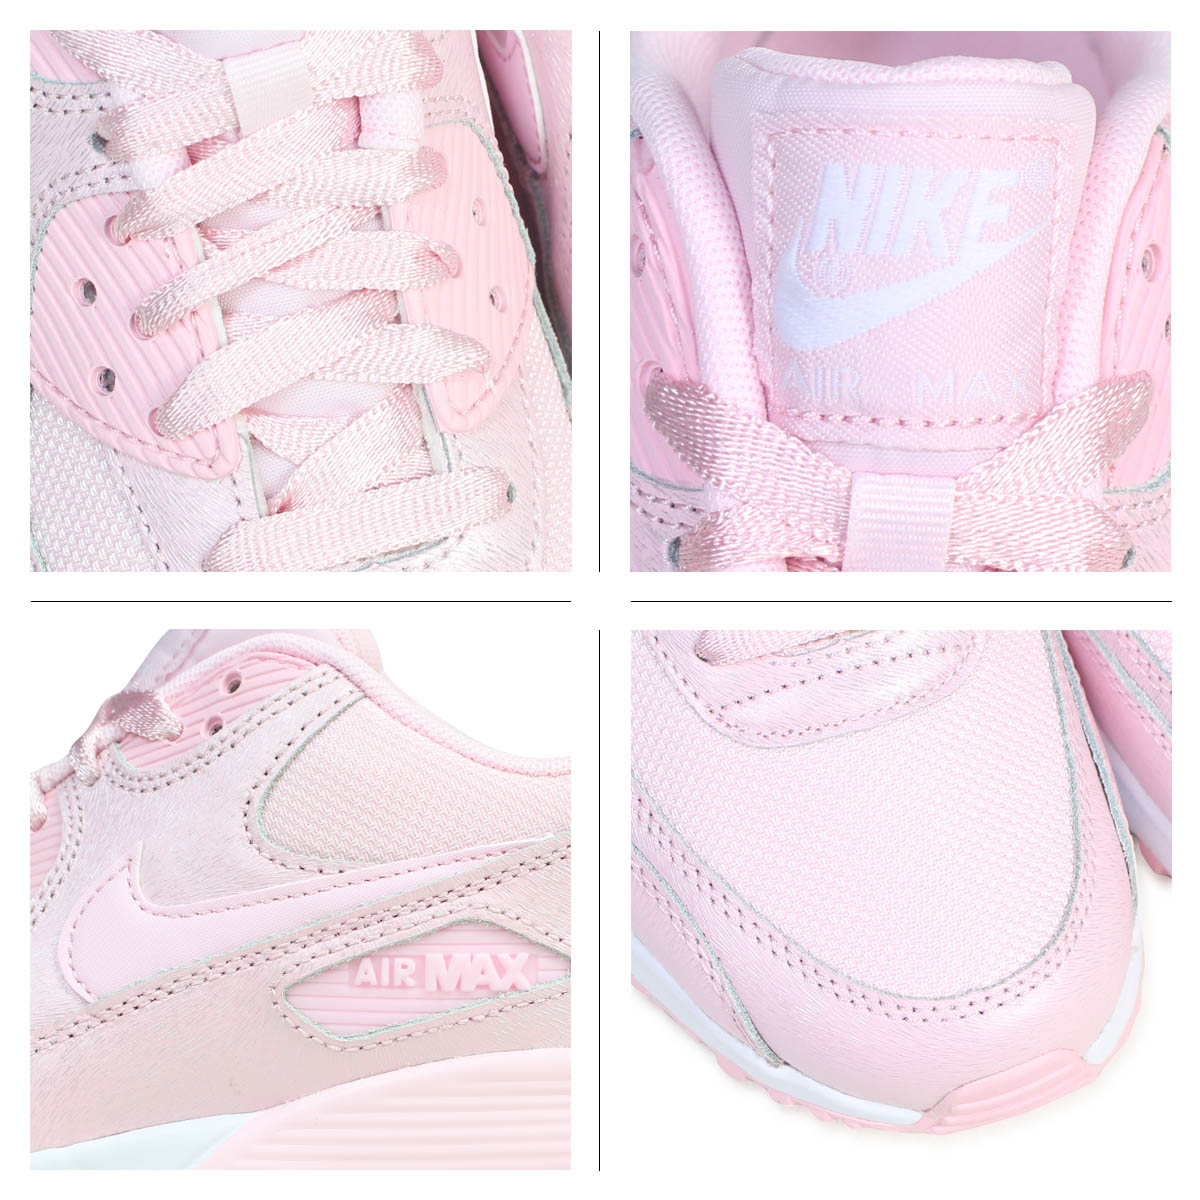 Nike Air Max 90 Gg (Prism Pink) Sneaker Freaker